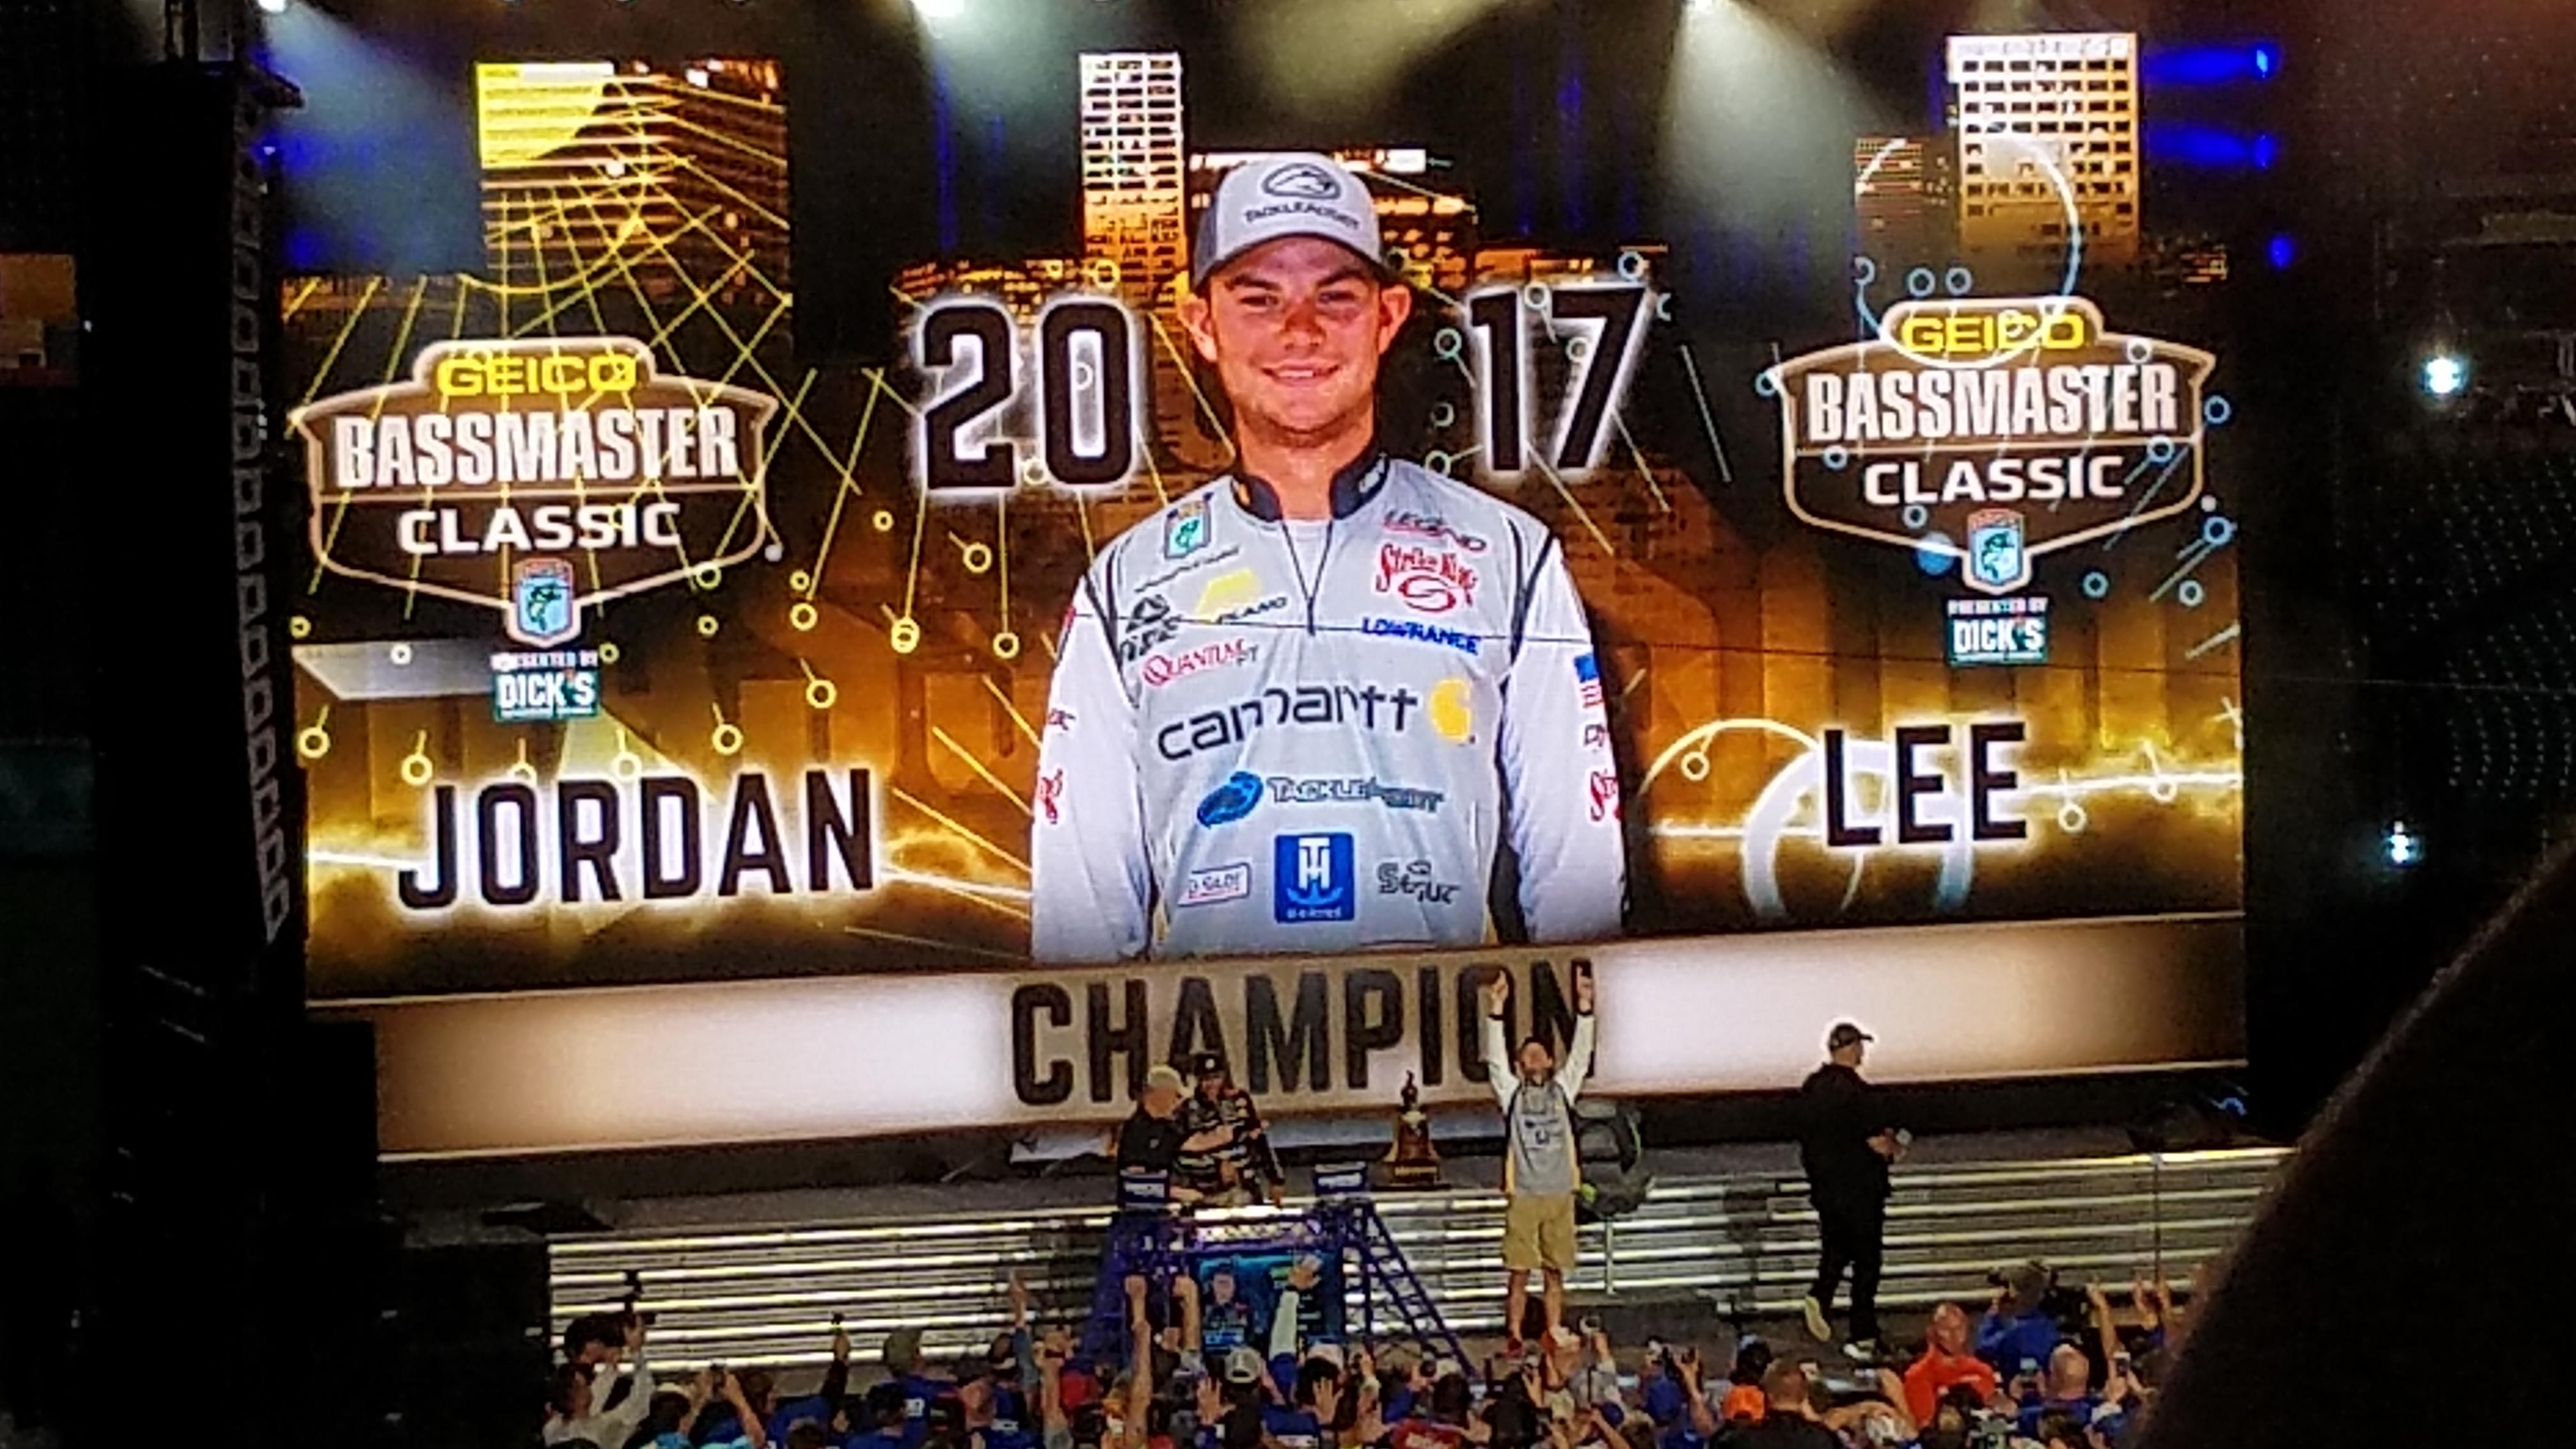 Jordan Lee, 2017 GEICO Bassmaster Champion